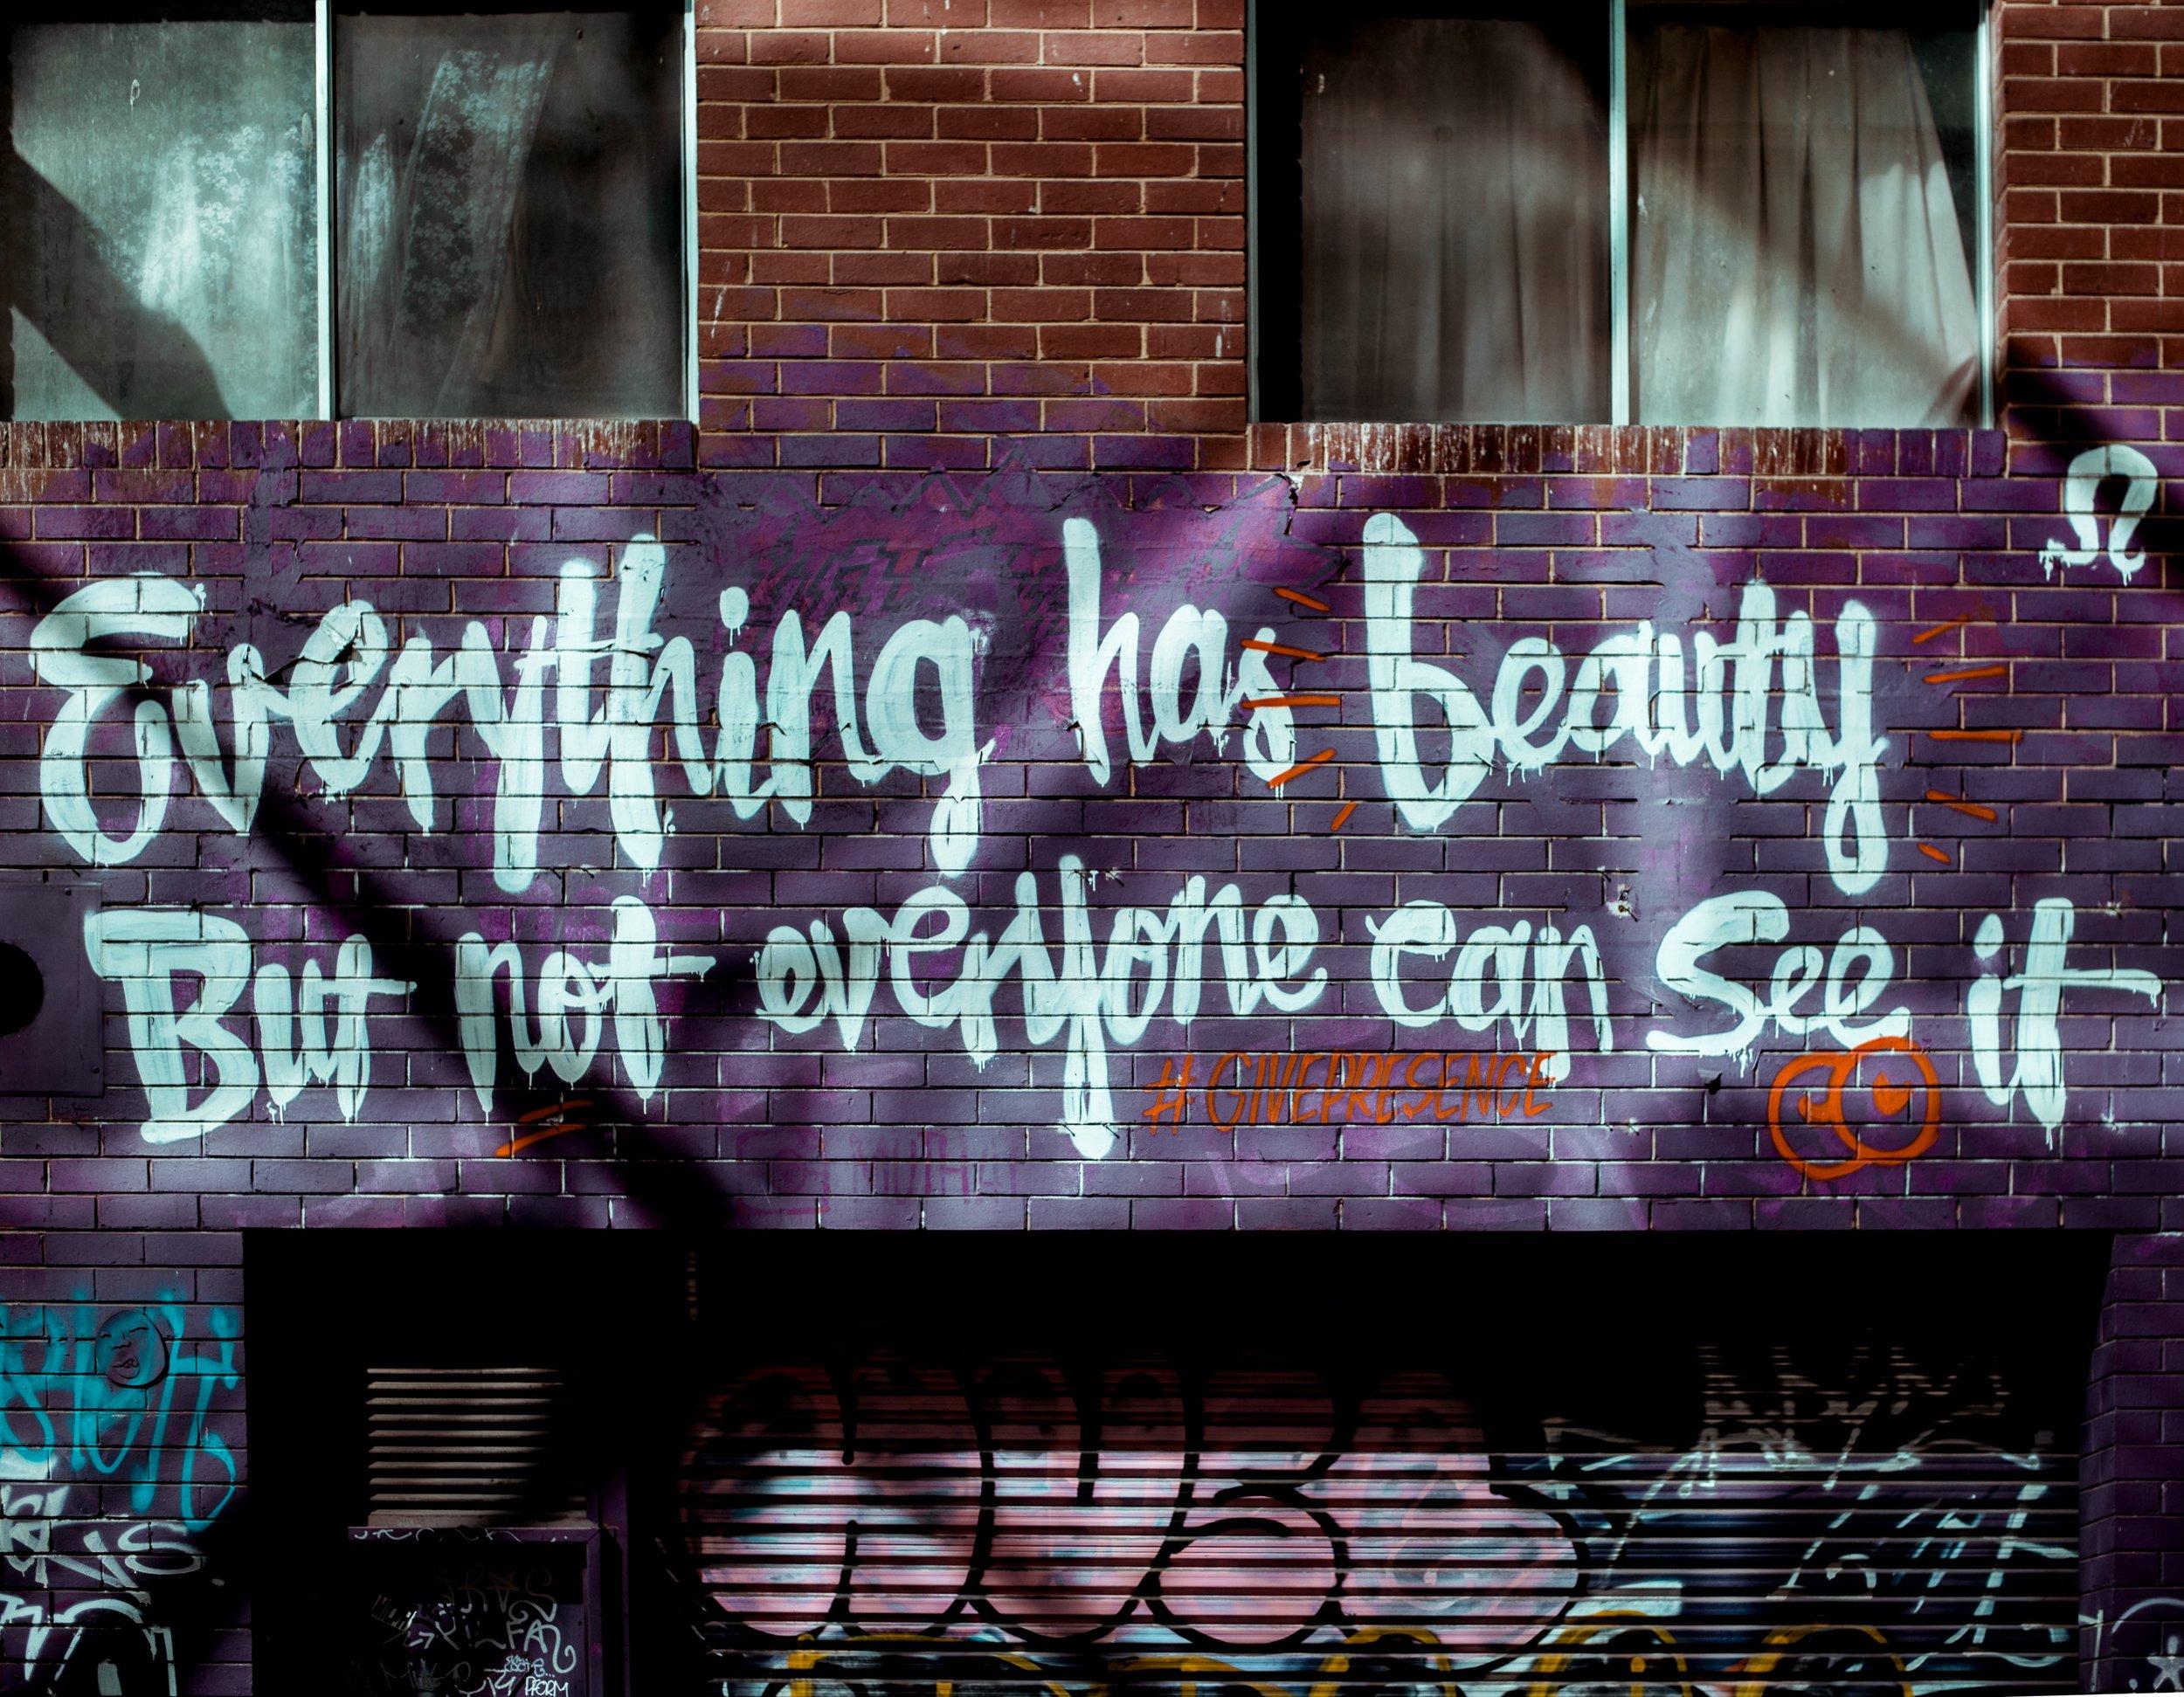 Photo: Unsplash - Amy Spratt